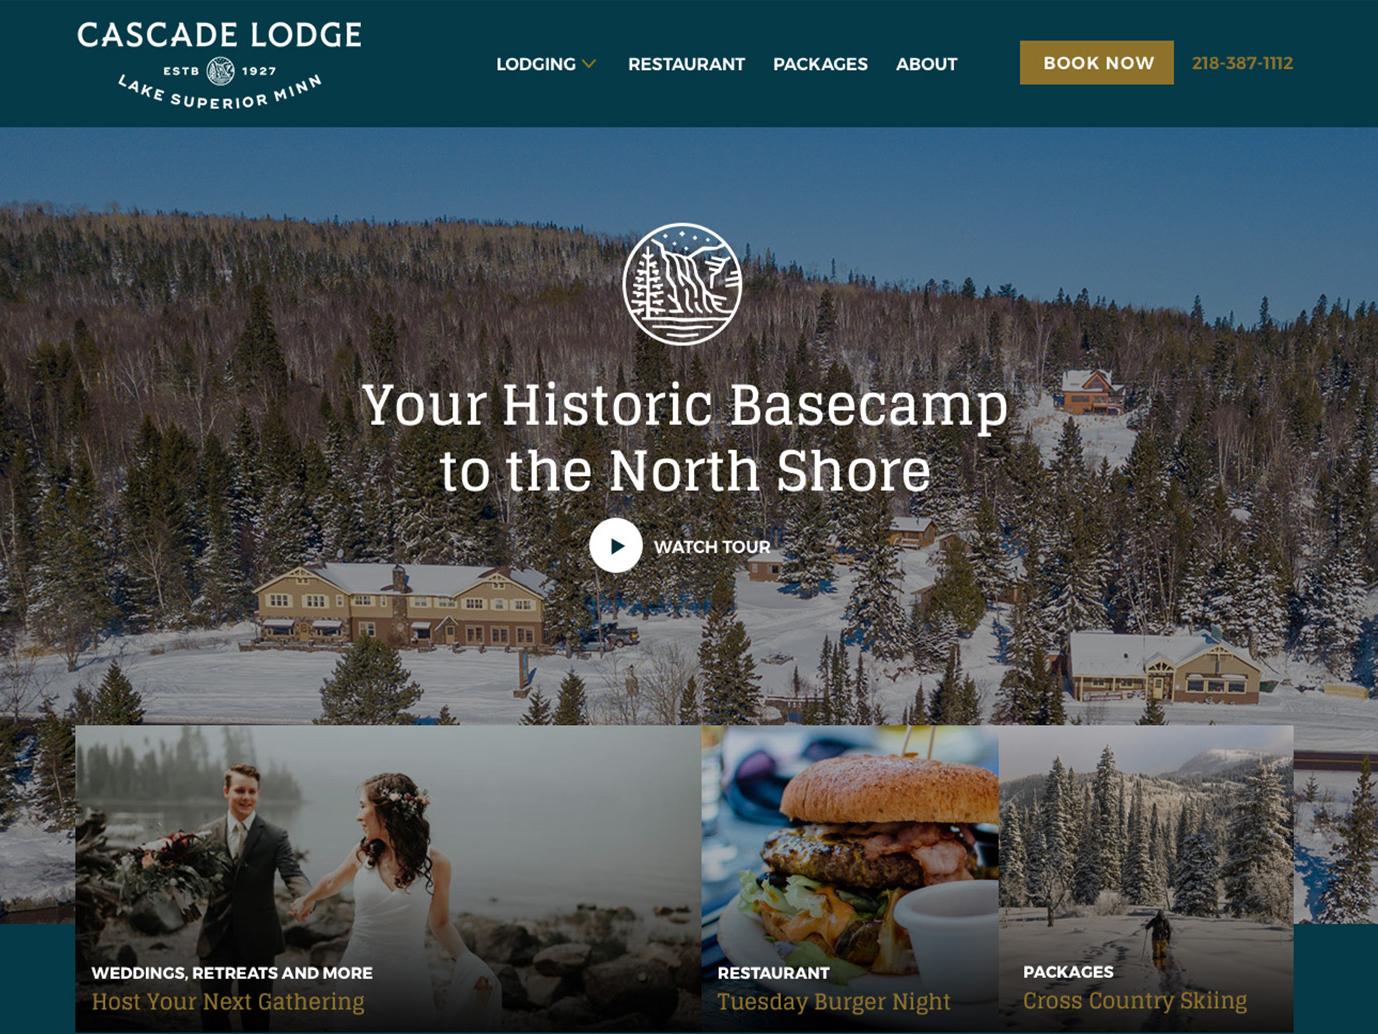 Cascade Lodge Website Design hospitality cabin vacation rental lodge minnesota tourism travel website web design